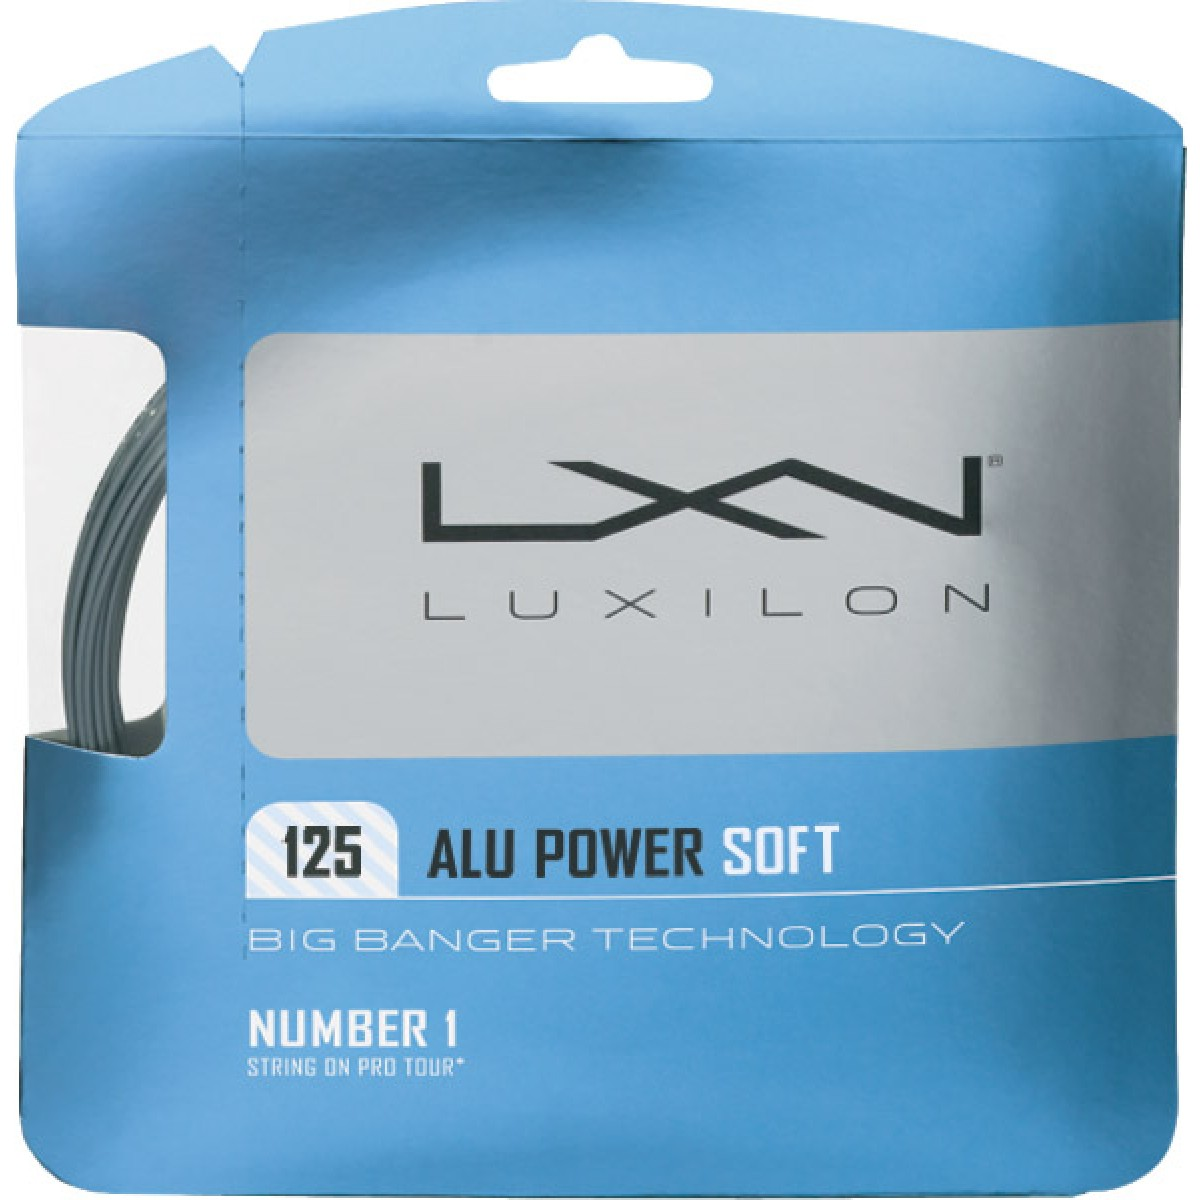 CORDAGE LUXILON ALU POWER SOFT  (12 METRES)